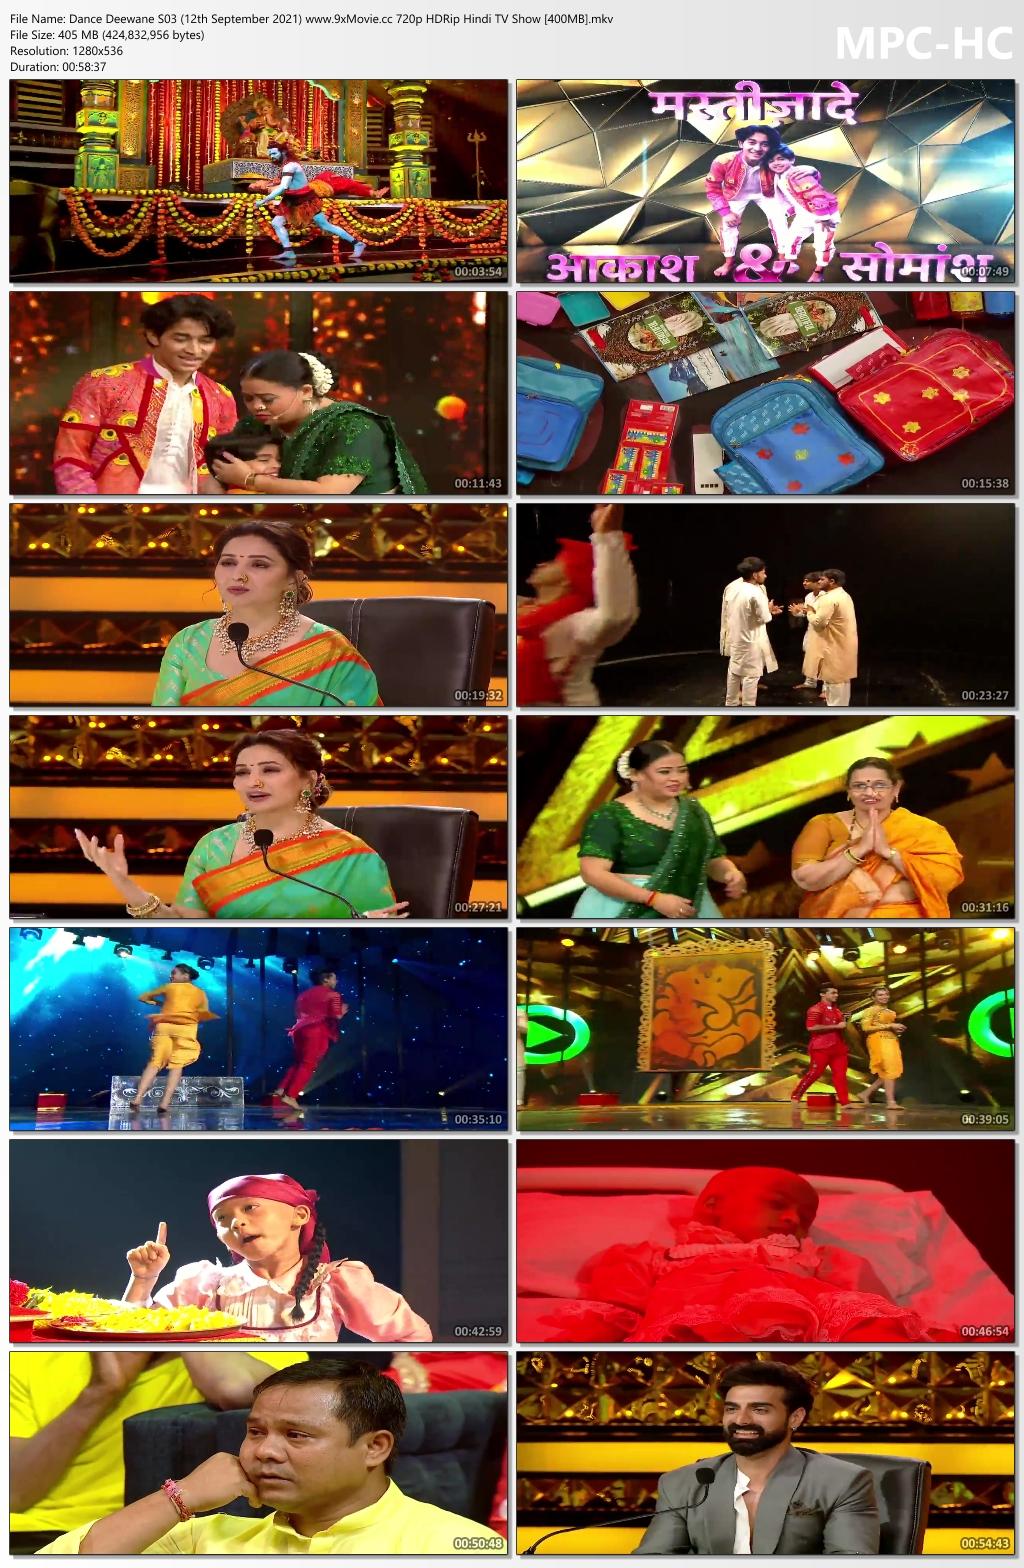 Dance-Deewane-S03-12th-September-2021-www-9x-Movie-cc-720p-HDRip-Hindi-TV-Show-400-MB-mkv